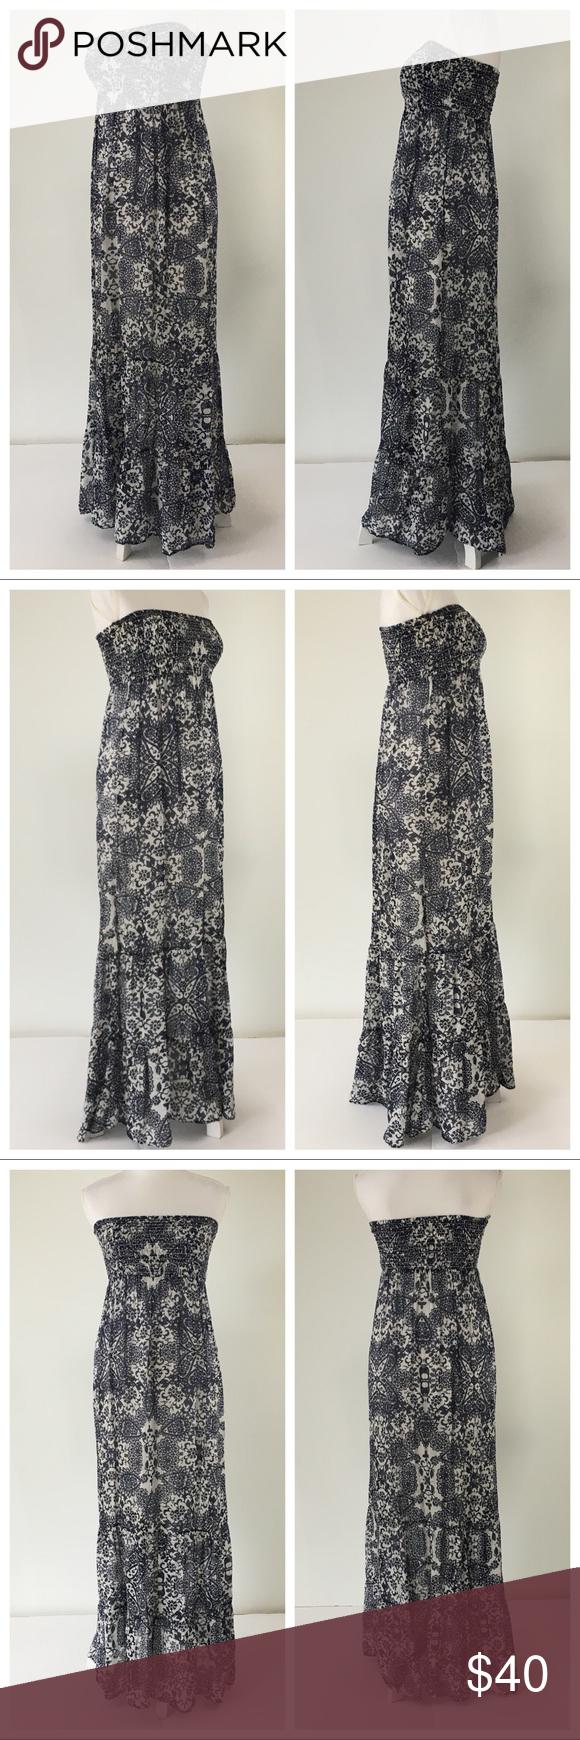 18230f9821 Guess silk maxi dress strapless blue white print M